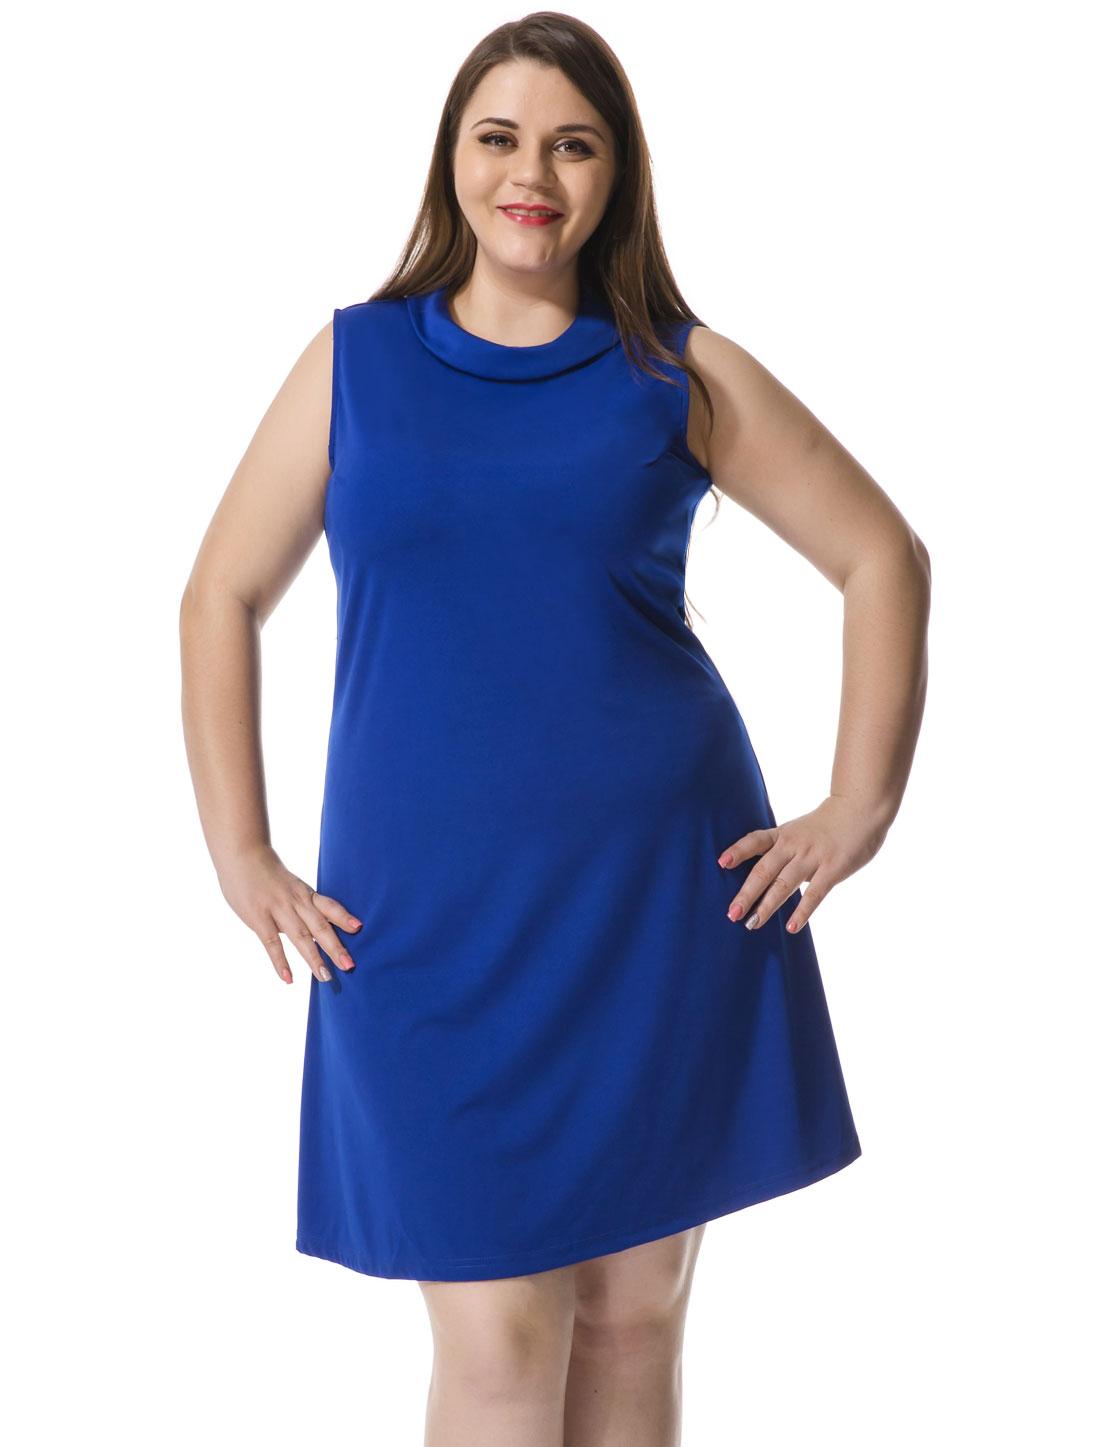 Women Plus Size Turn Down Collar Sleeveless Dress Blue 1X